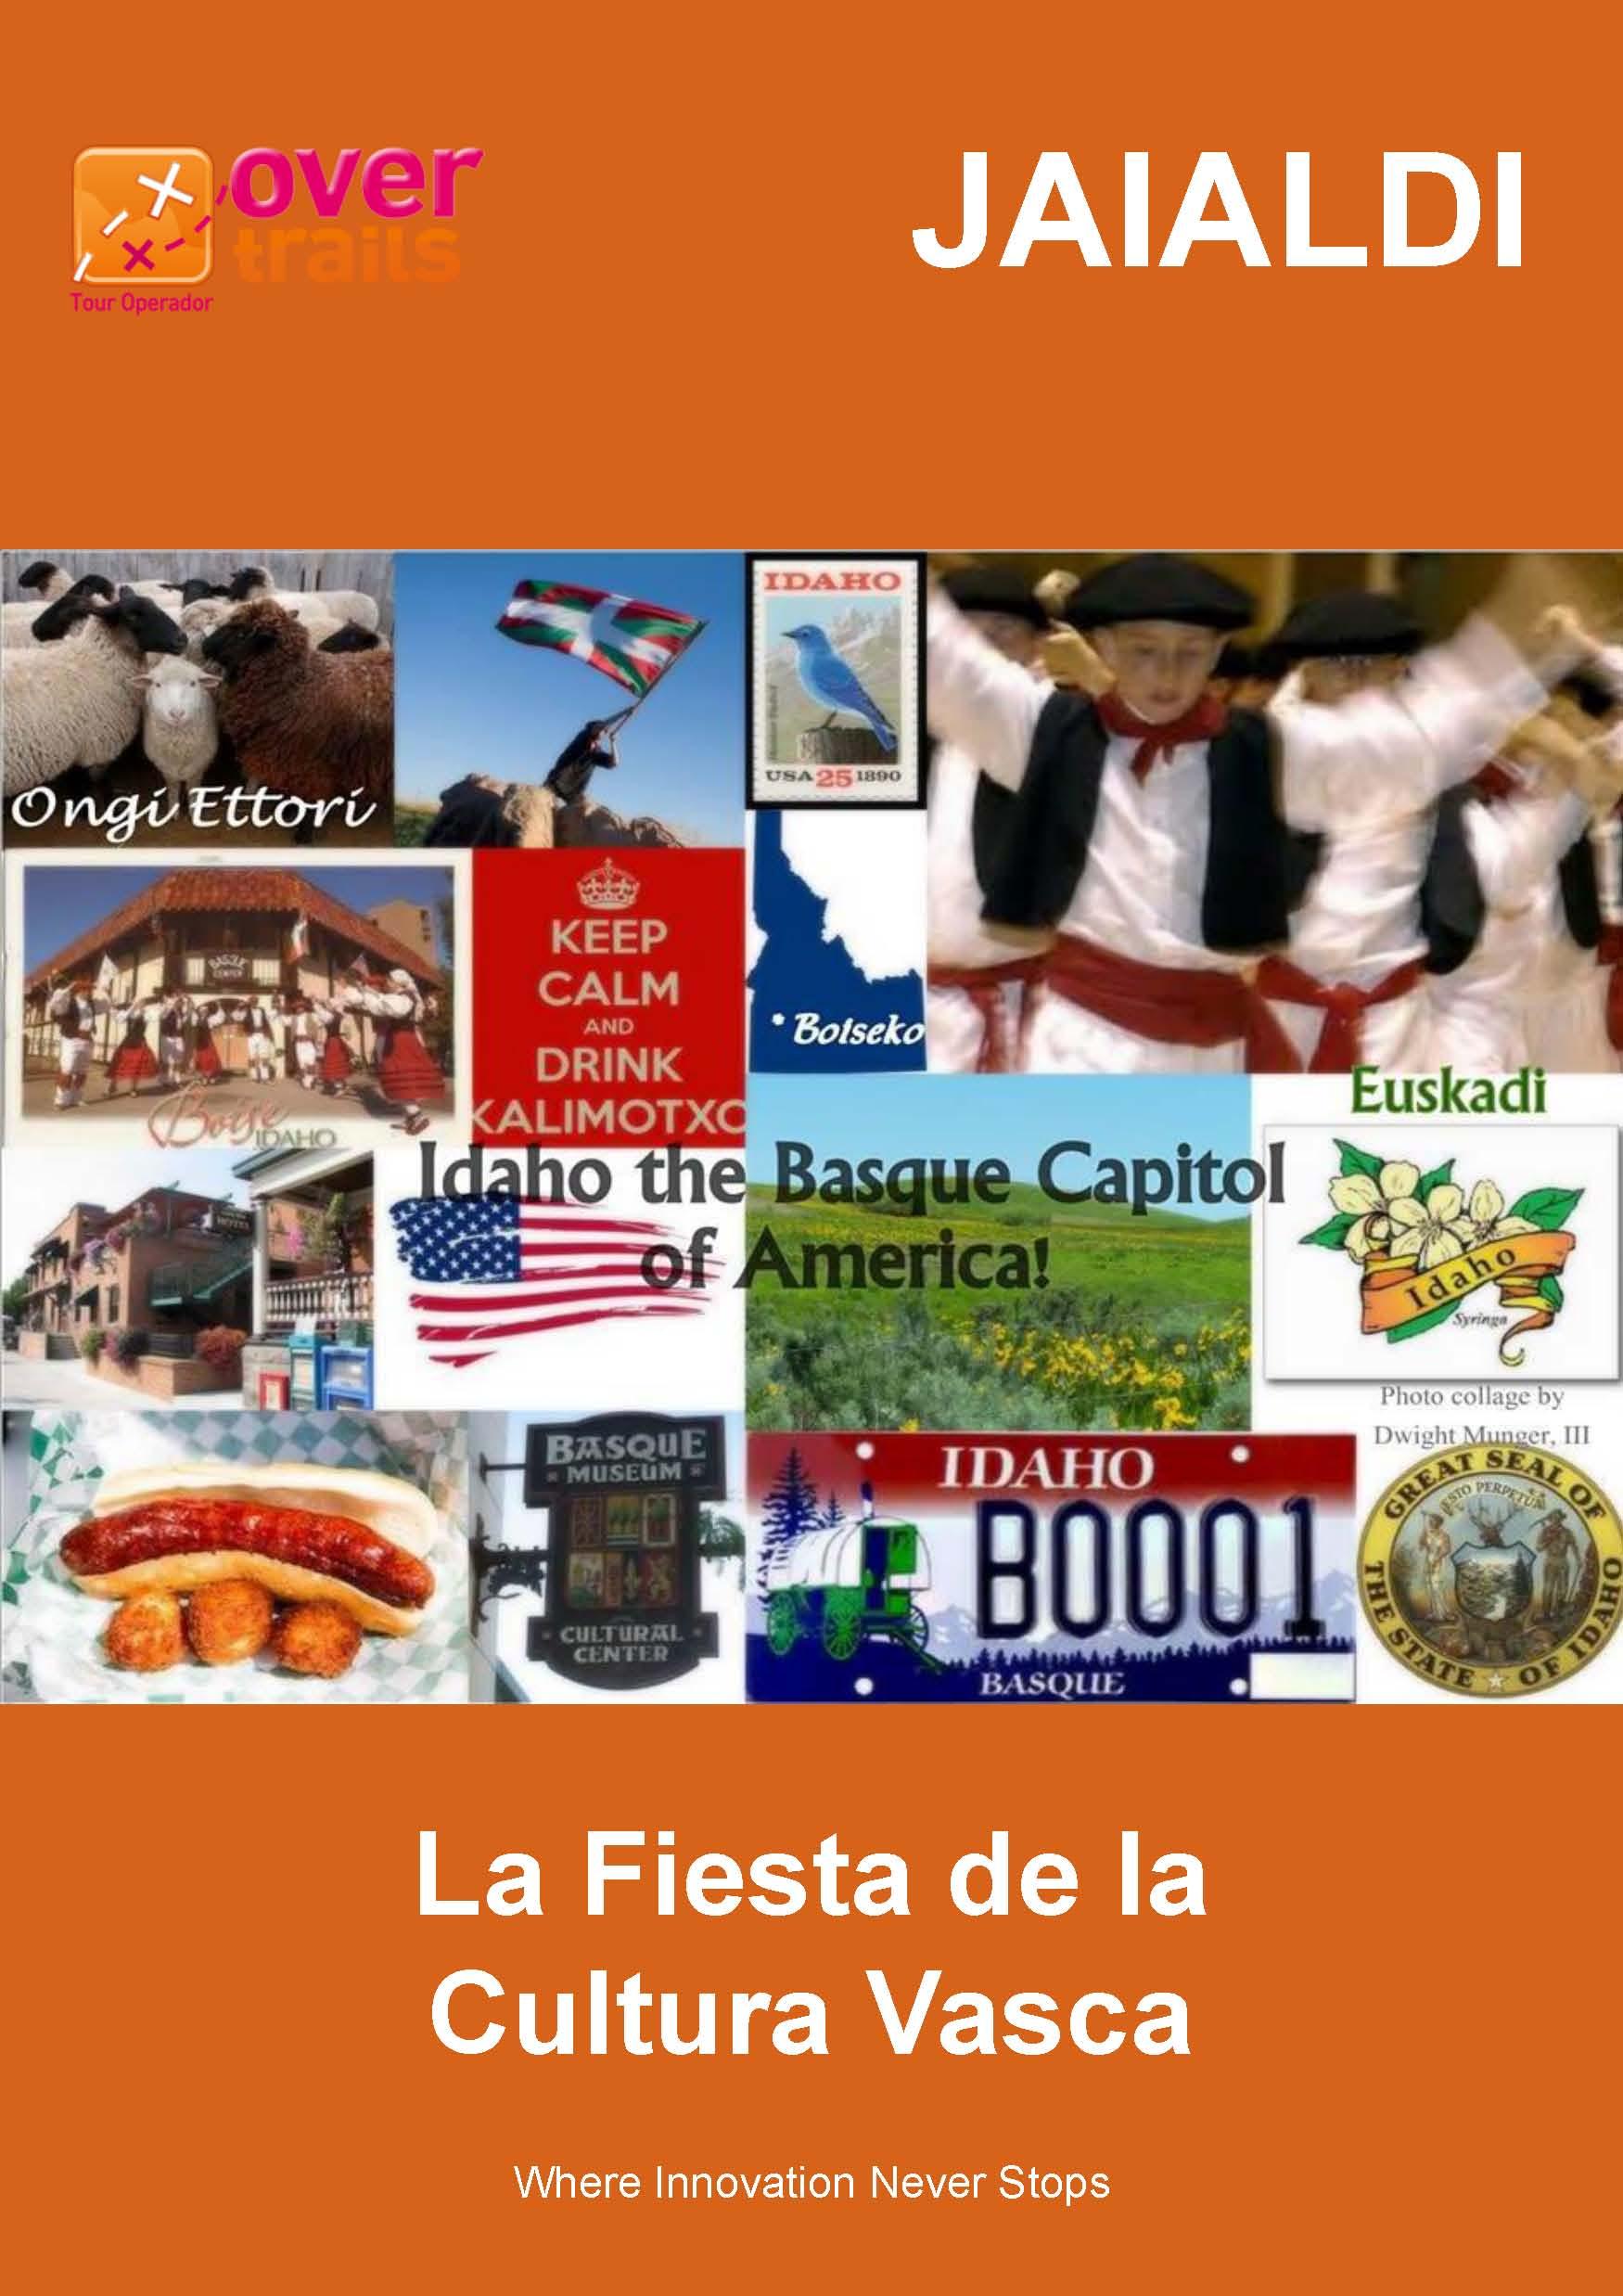 folleto_jaialdi_sin_fecha